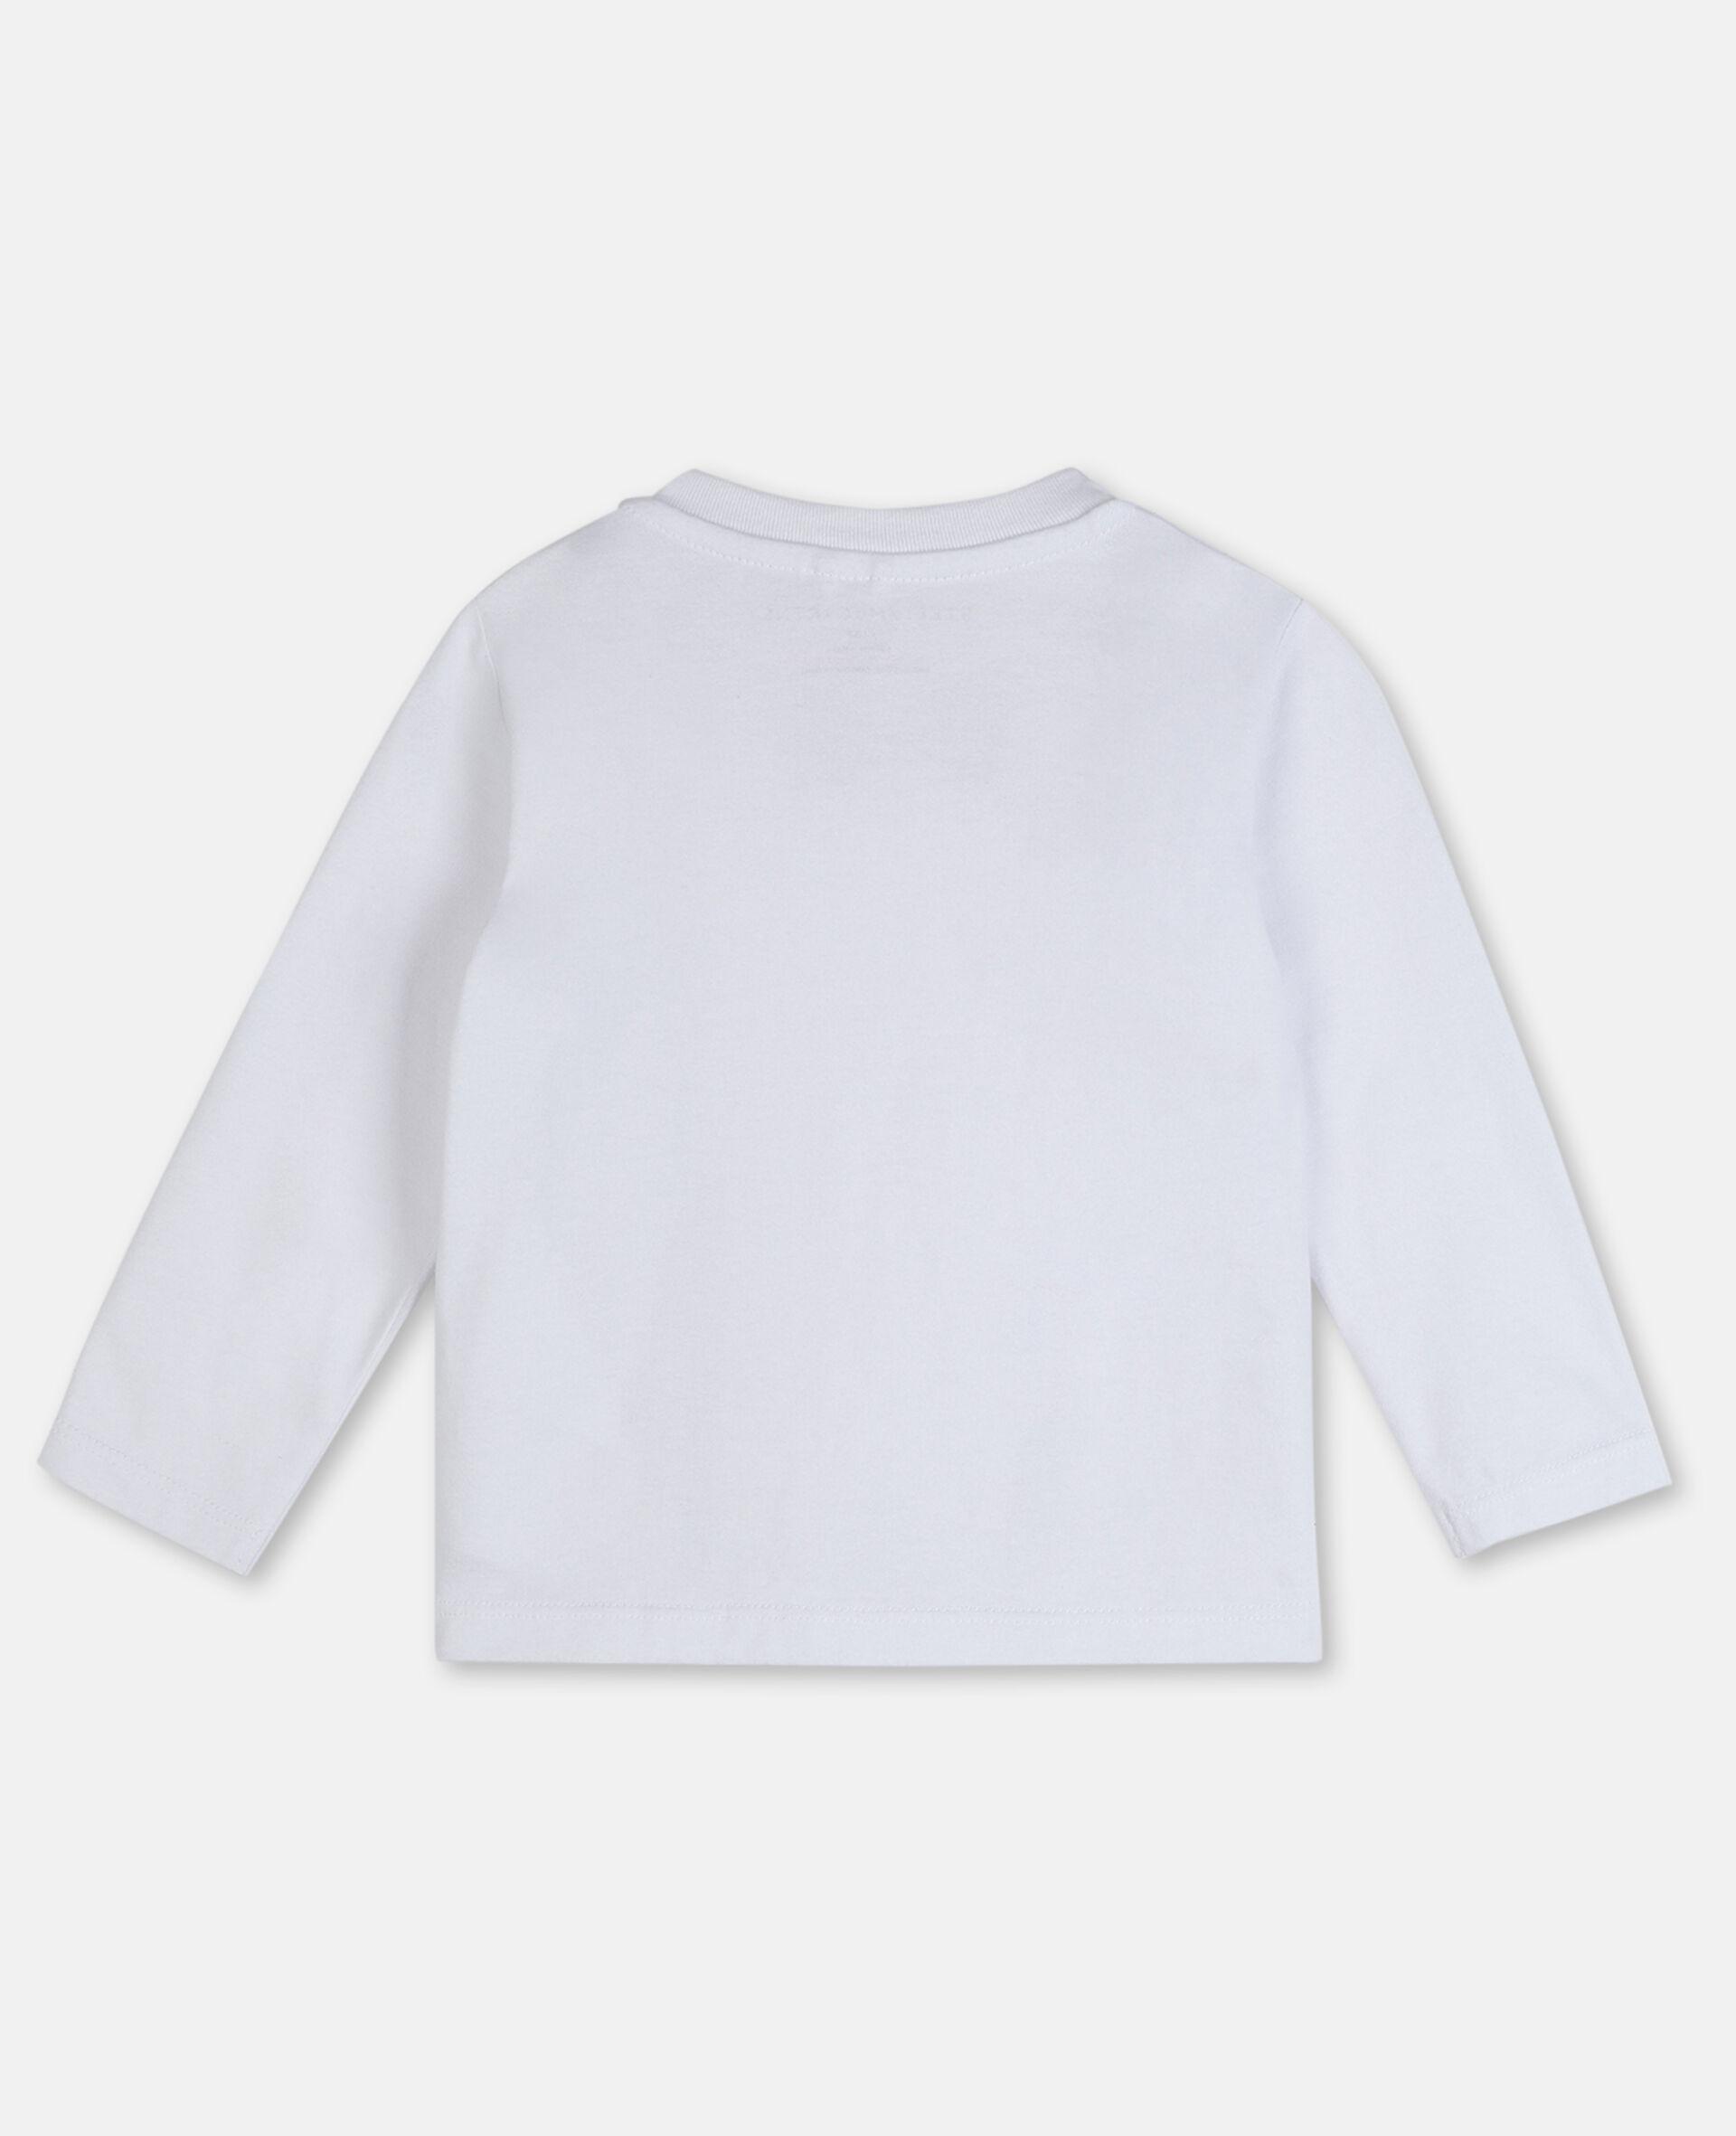 Braces Cotton T-shirt -White-large image number 3